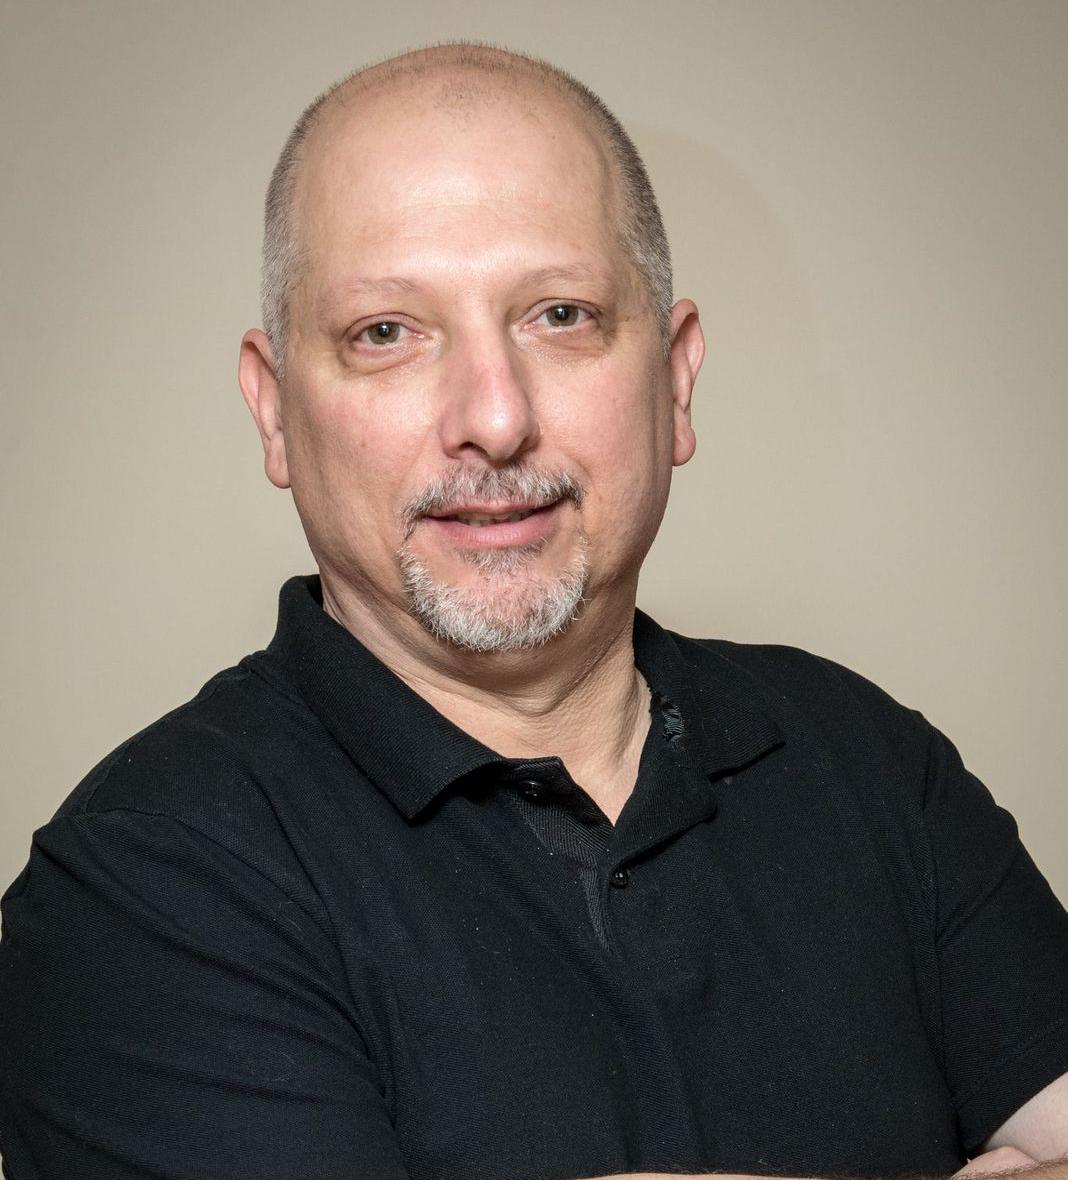 Michael Sesko